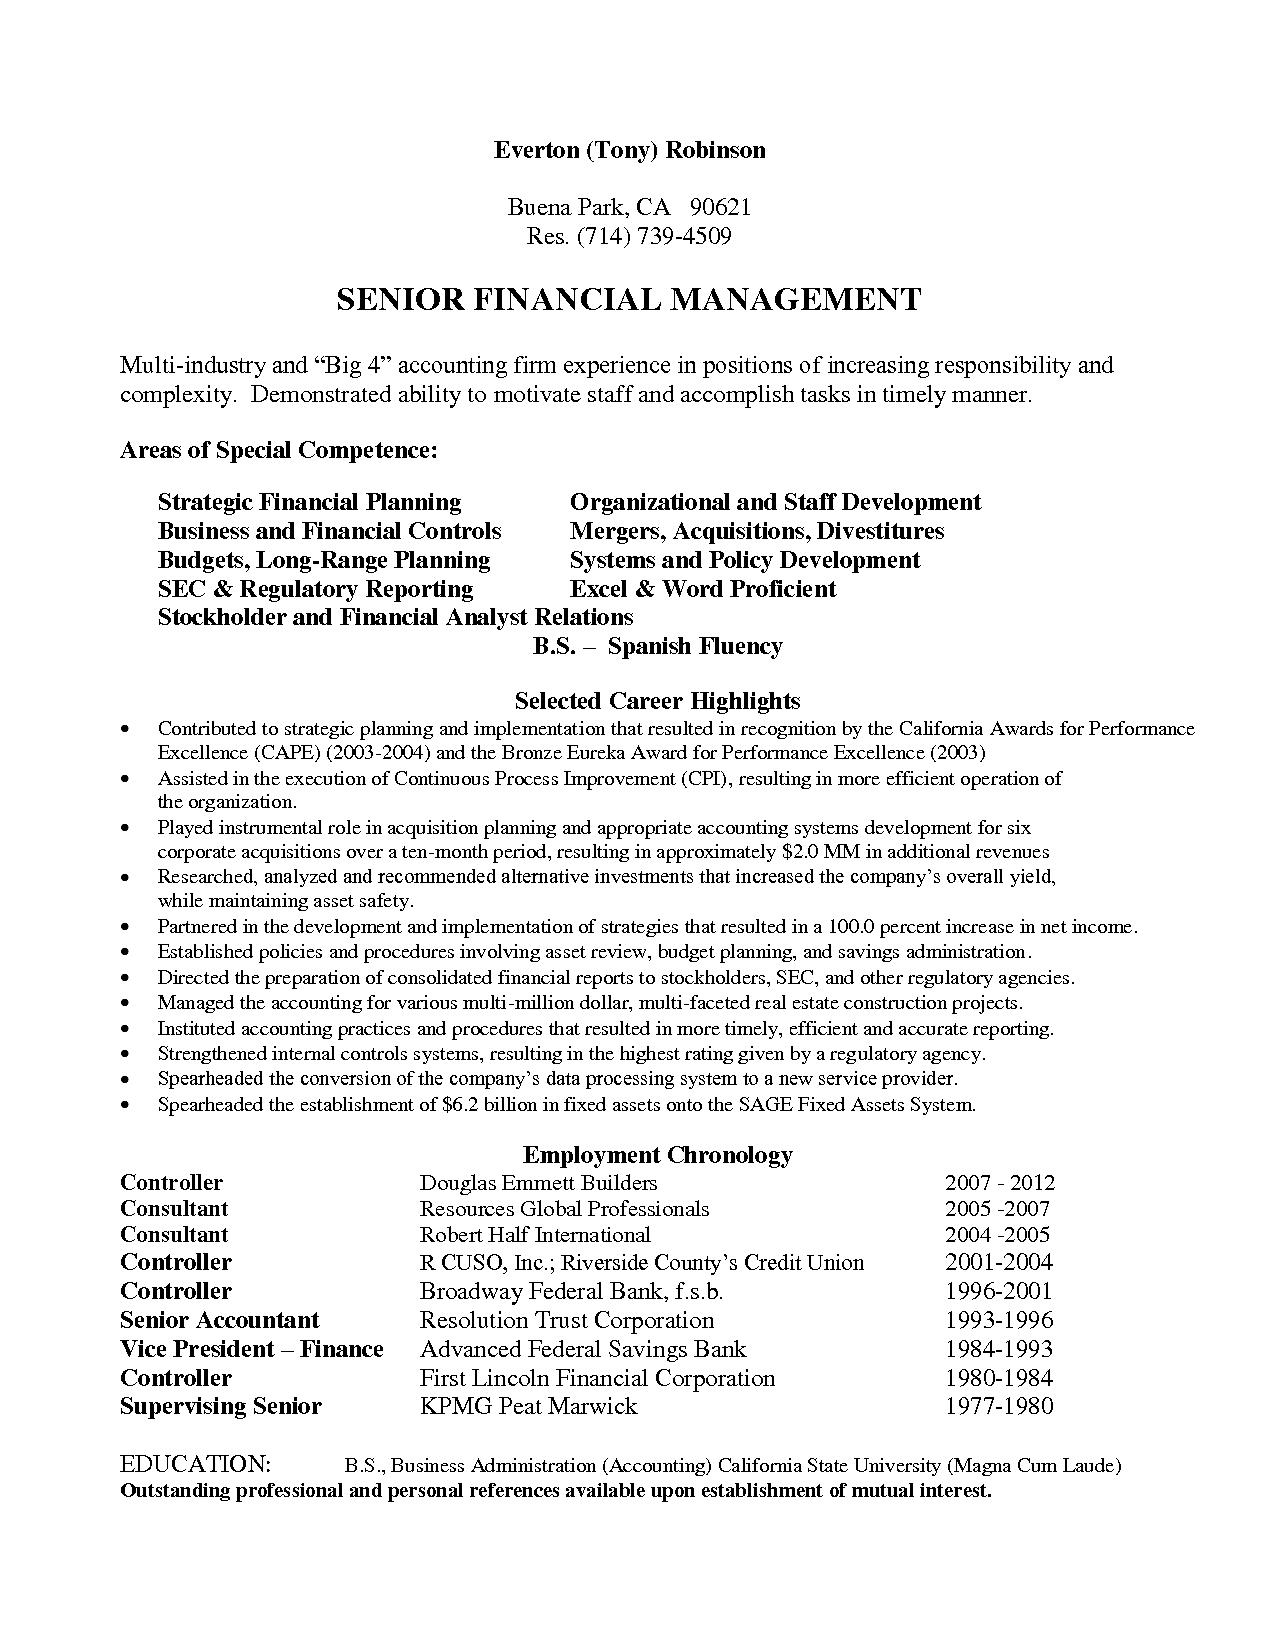 Big 4 Cv Template Resume Examples Professional Resume Examples Accountant Resume Resume Examples